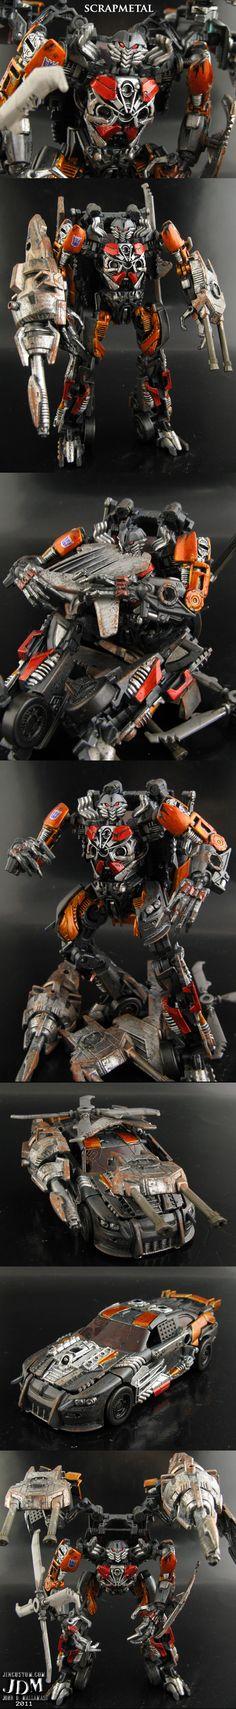 Custom Transformers Scrapmetal by Jin-Saotome.deviantart.com on @deviantART